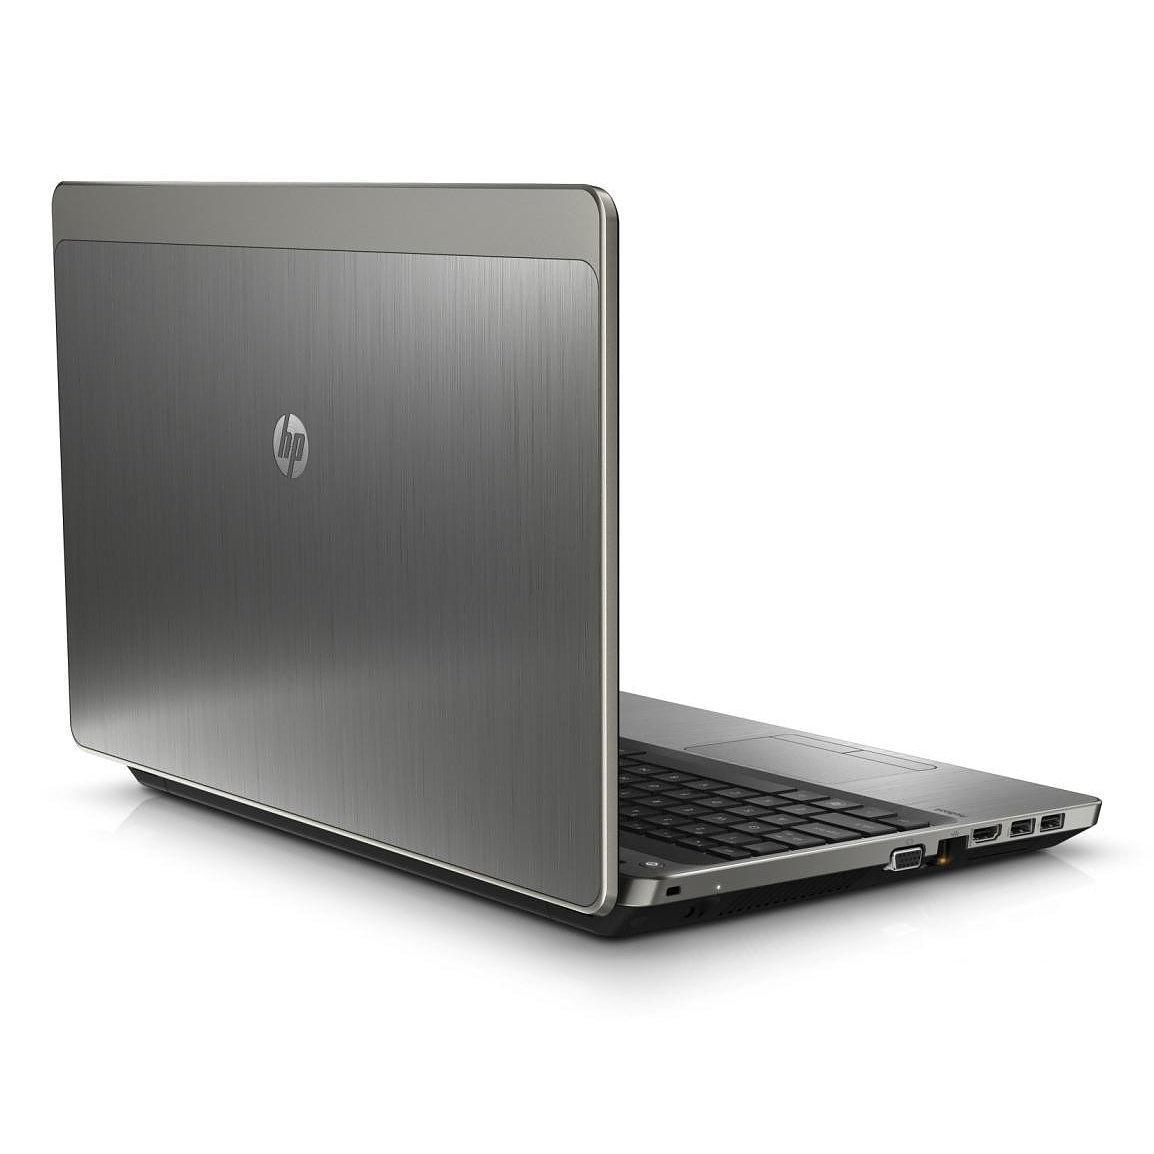 HP ProBook 4530S 15,6-inch (2011) - Core i3-2330M - 4GB - HDD 320 GB AZERTY - Francês